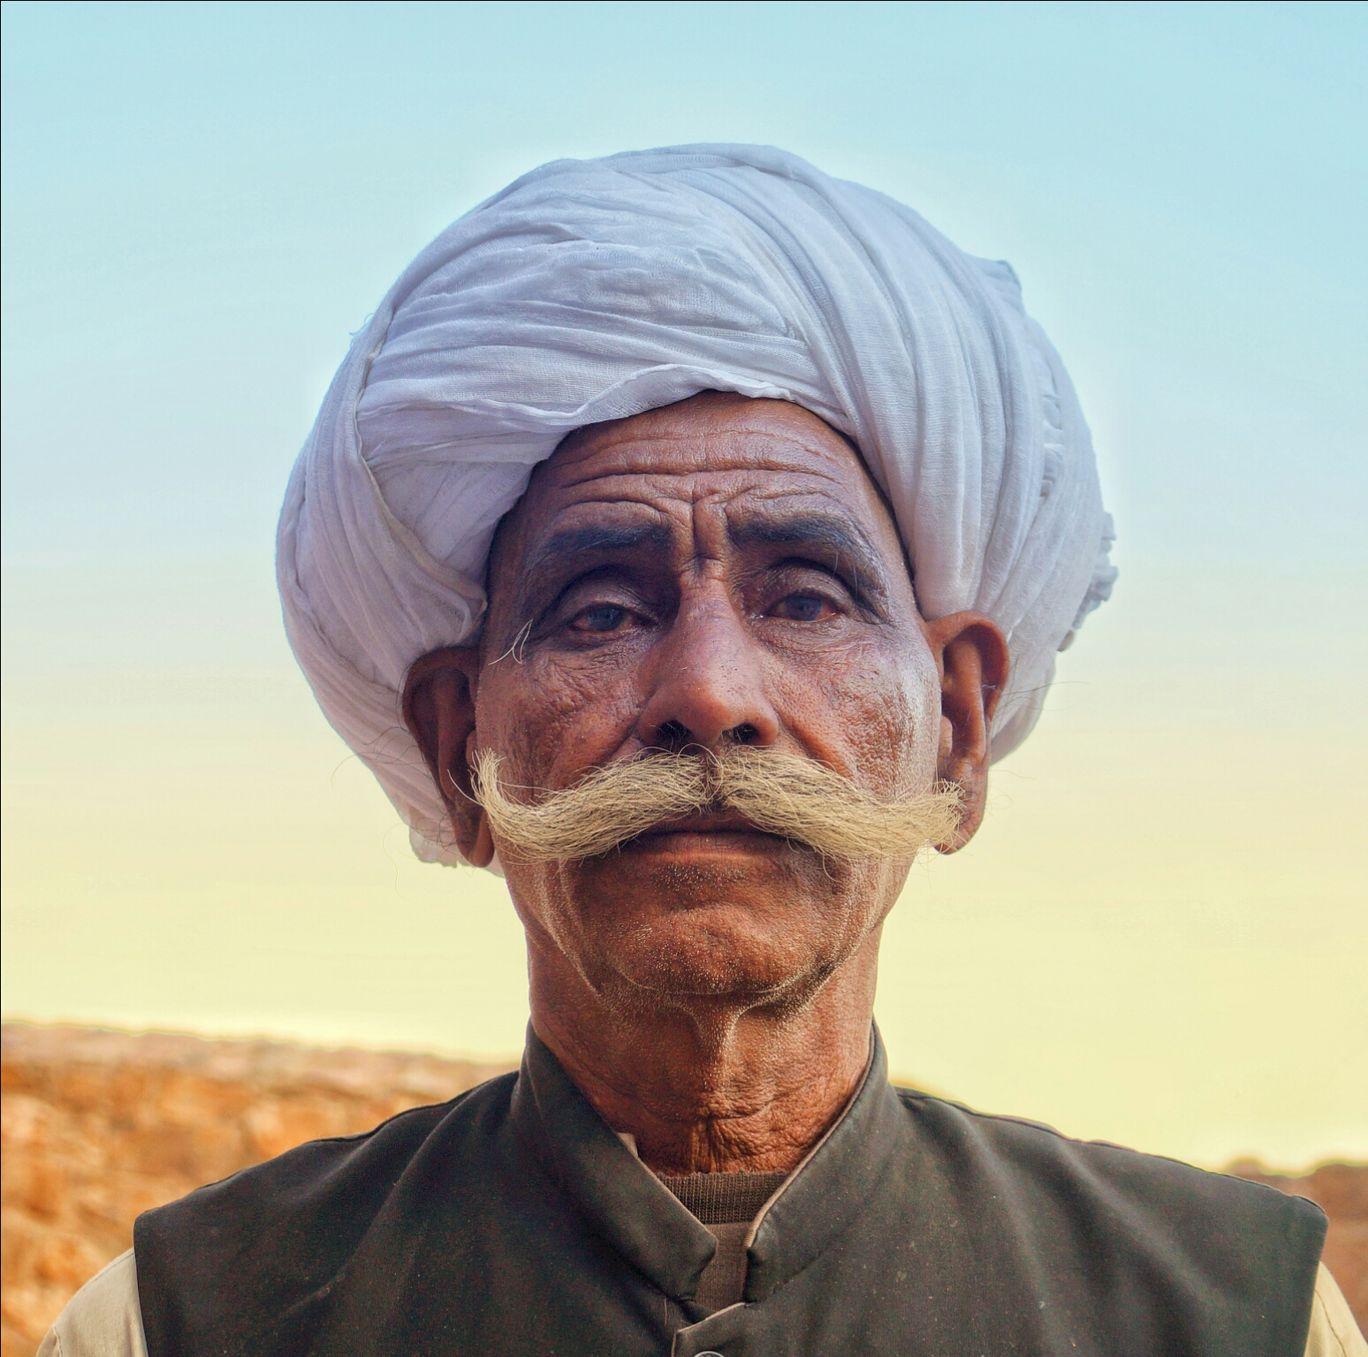 Photo of Rajasthan By Chetan Gandhi